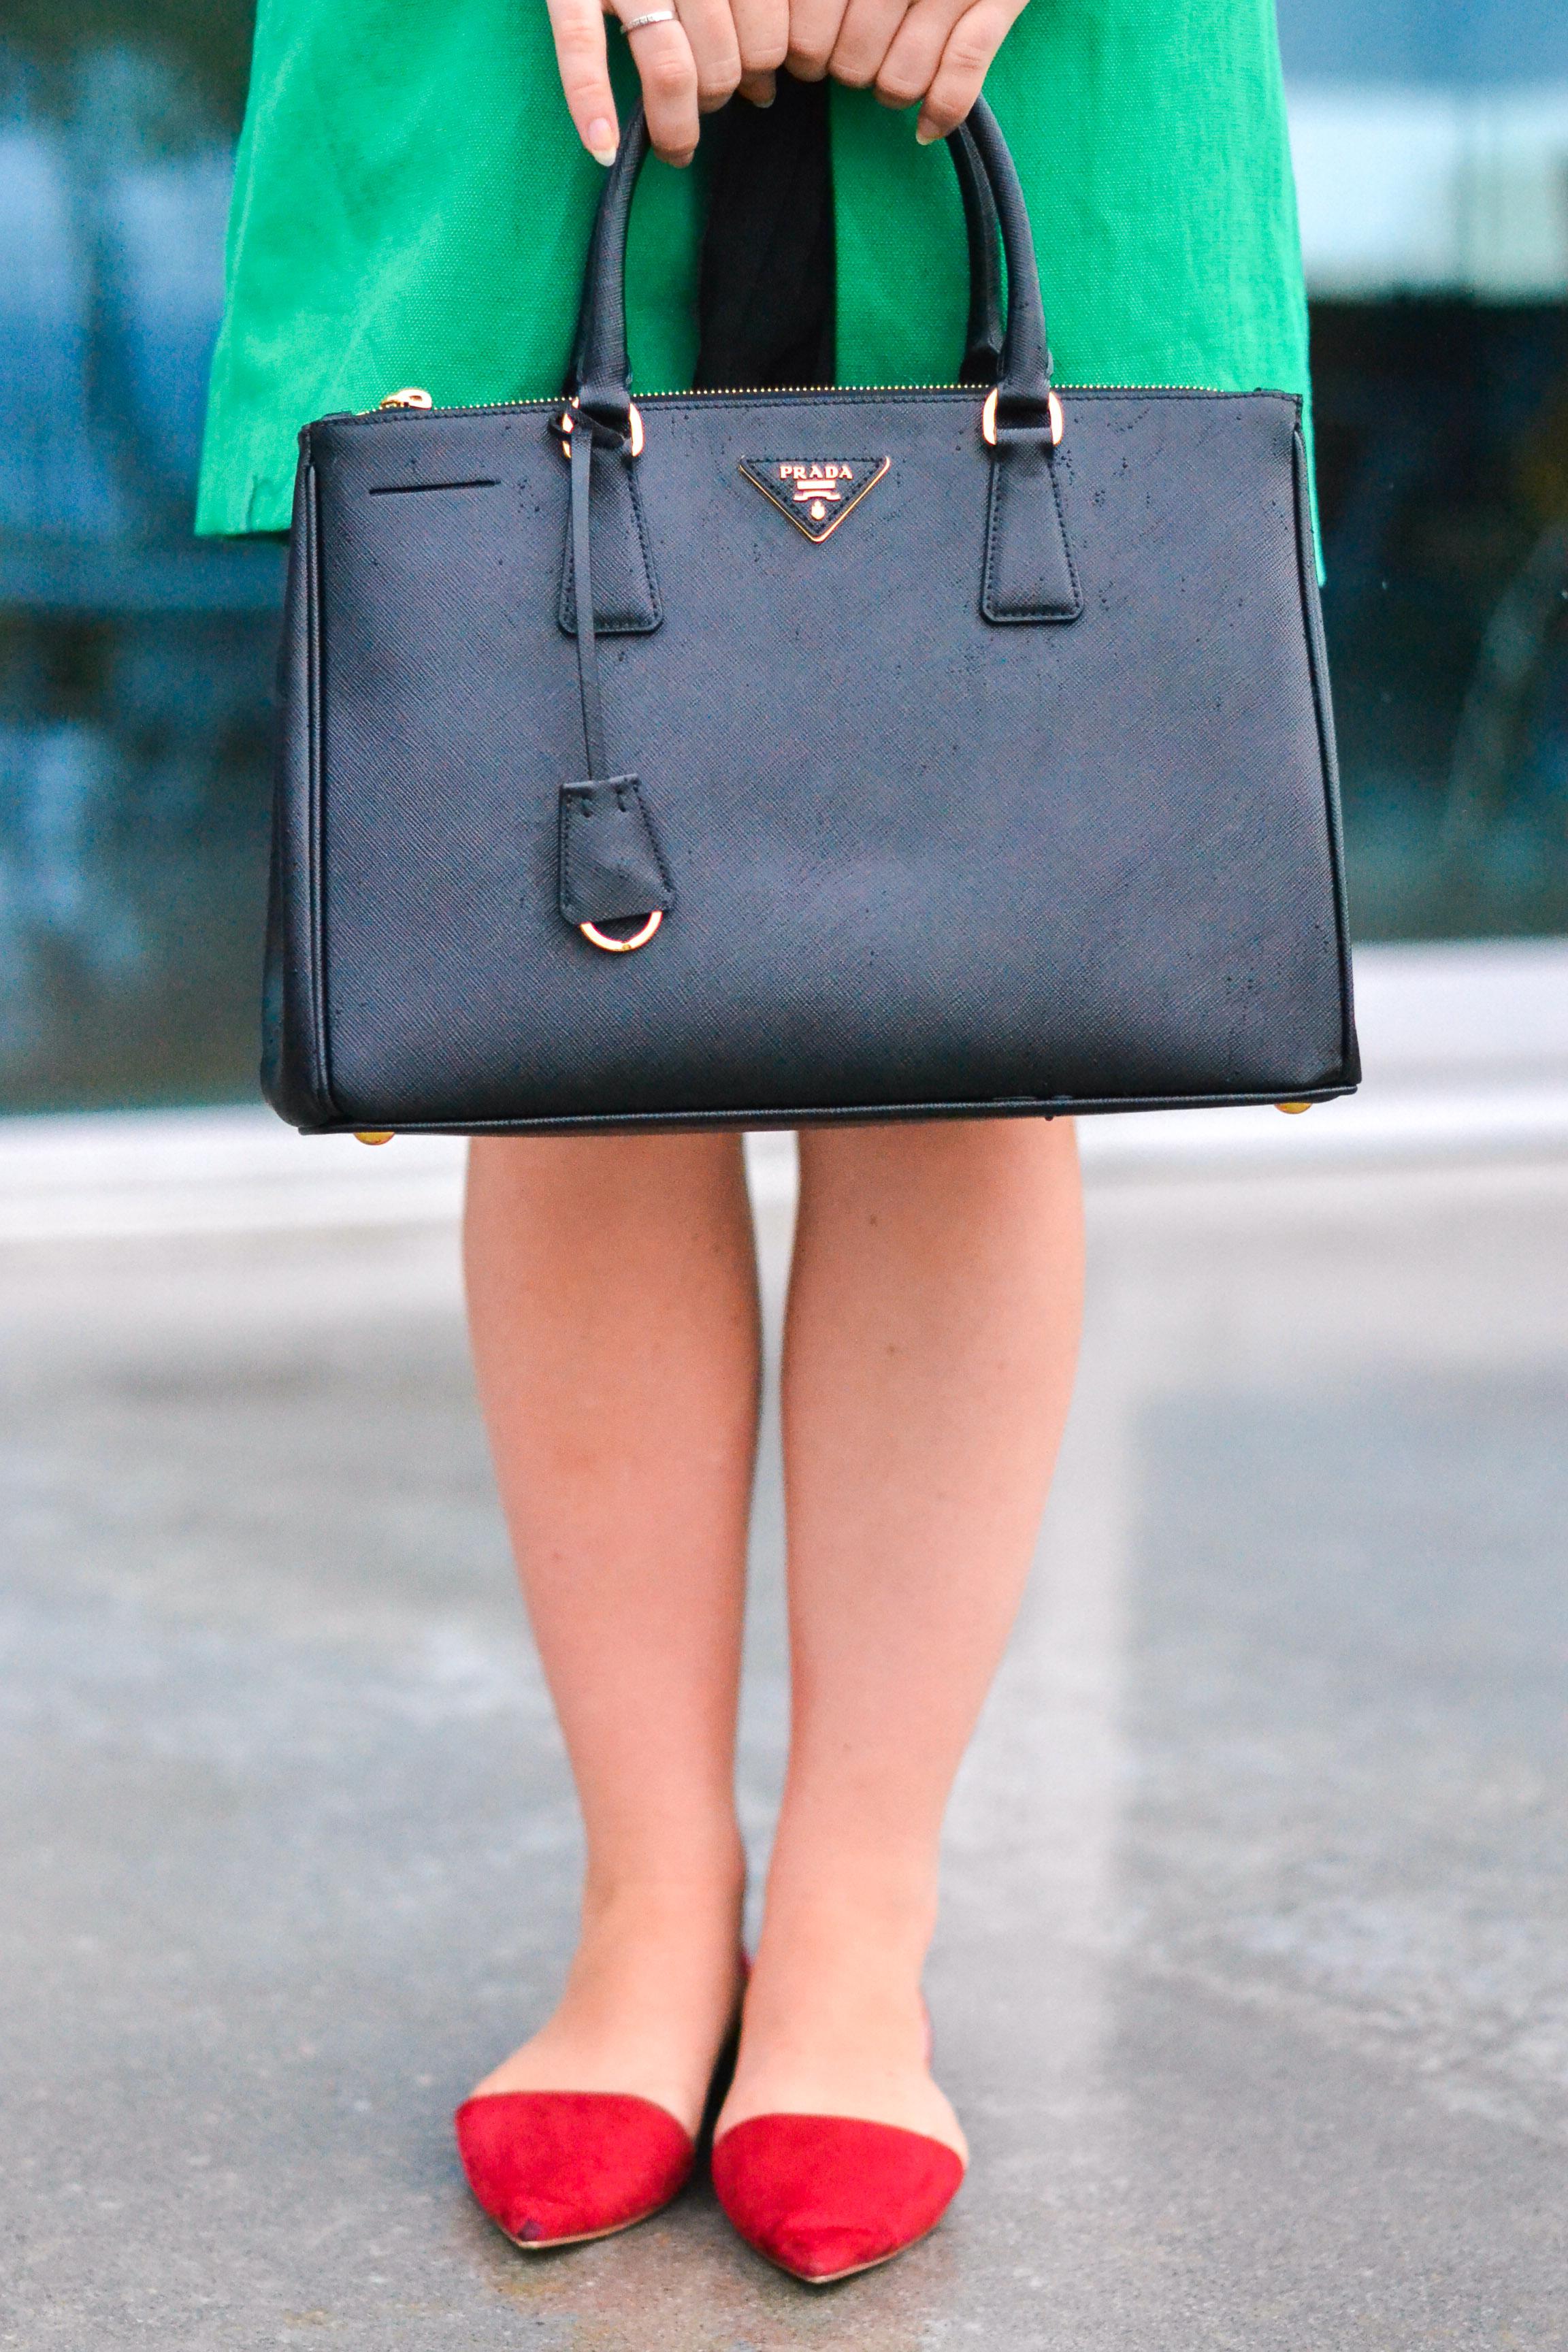 black prada tote bag - Prada Saffiano Lux Tote \u2013